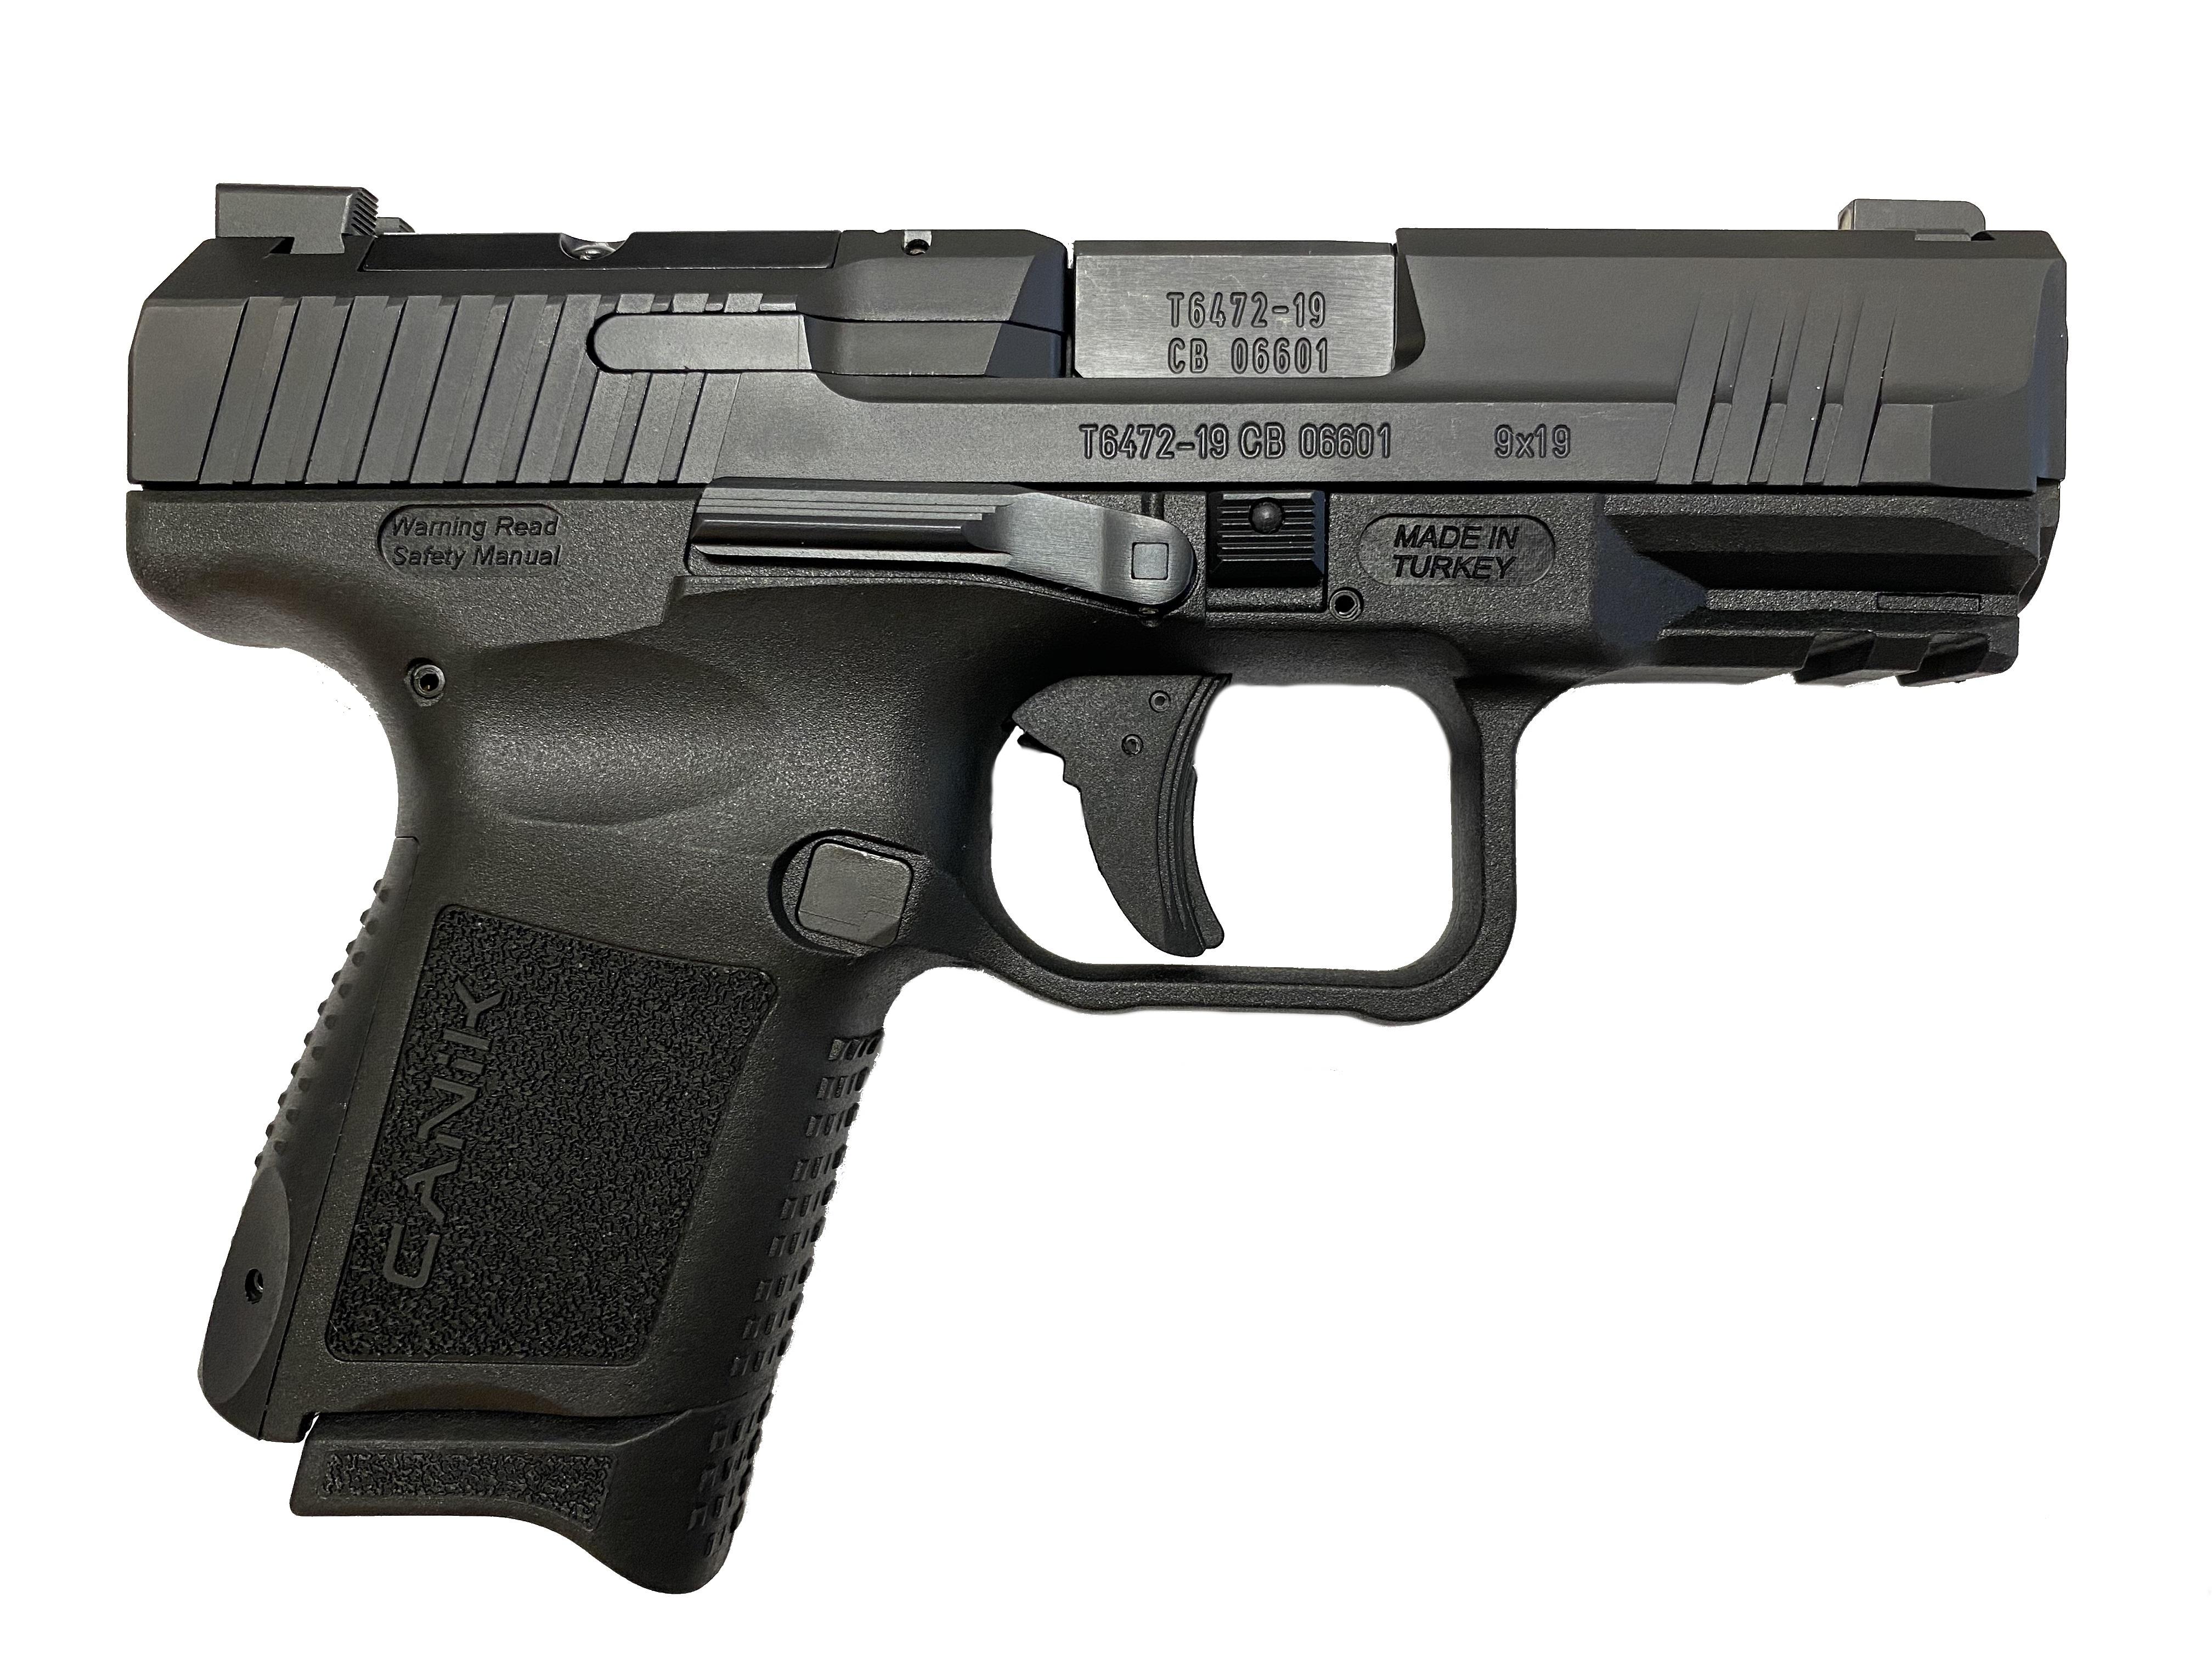 CANIK TP9 Elite SC 9mm